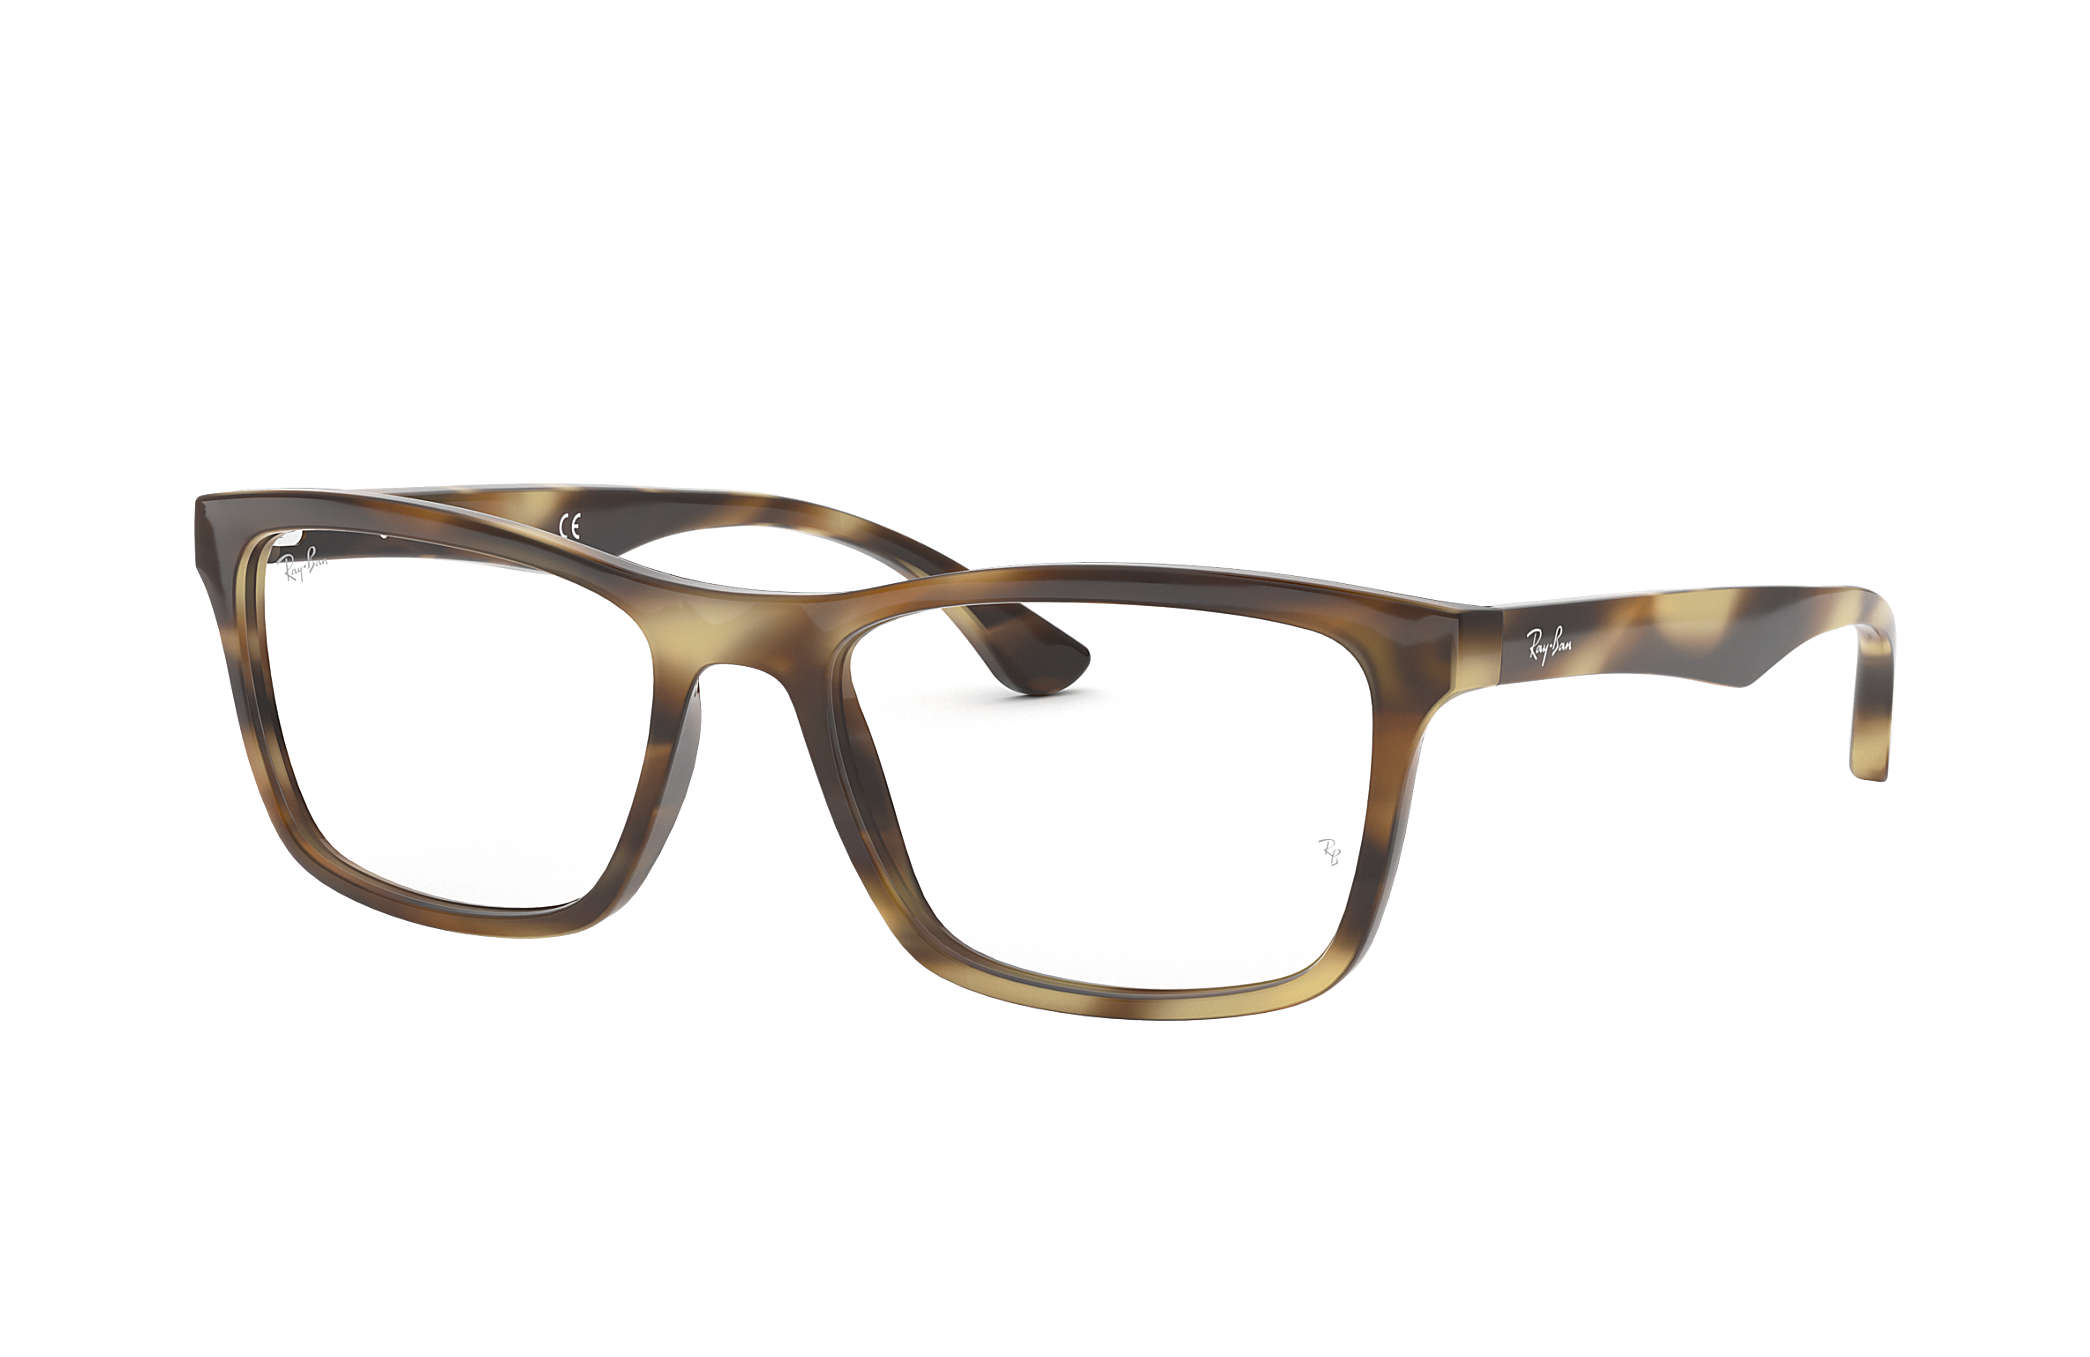 8df1a4affc Ray-Ban prescription glasses RB5279 Light Brown - Acetate ...